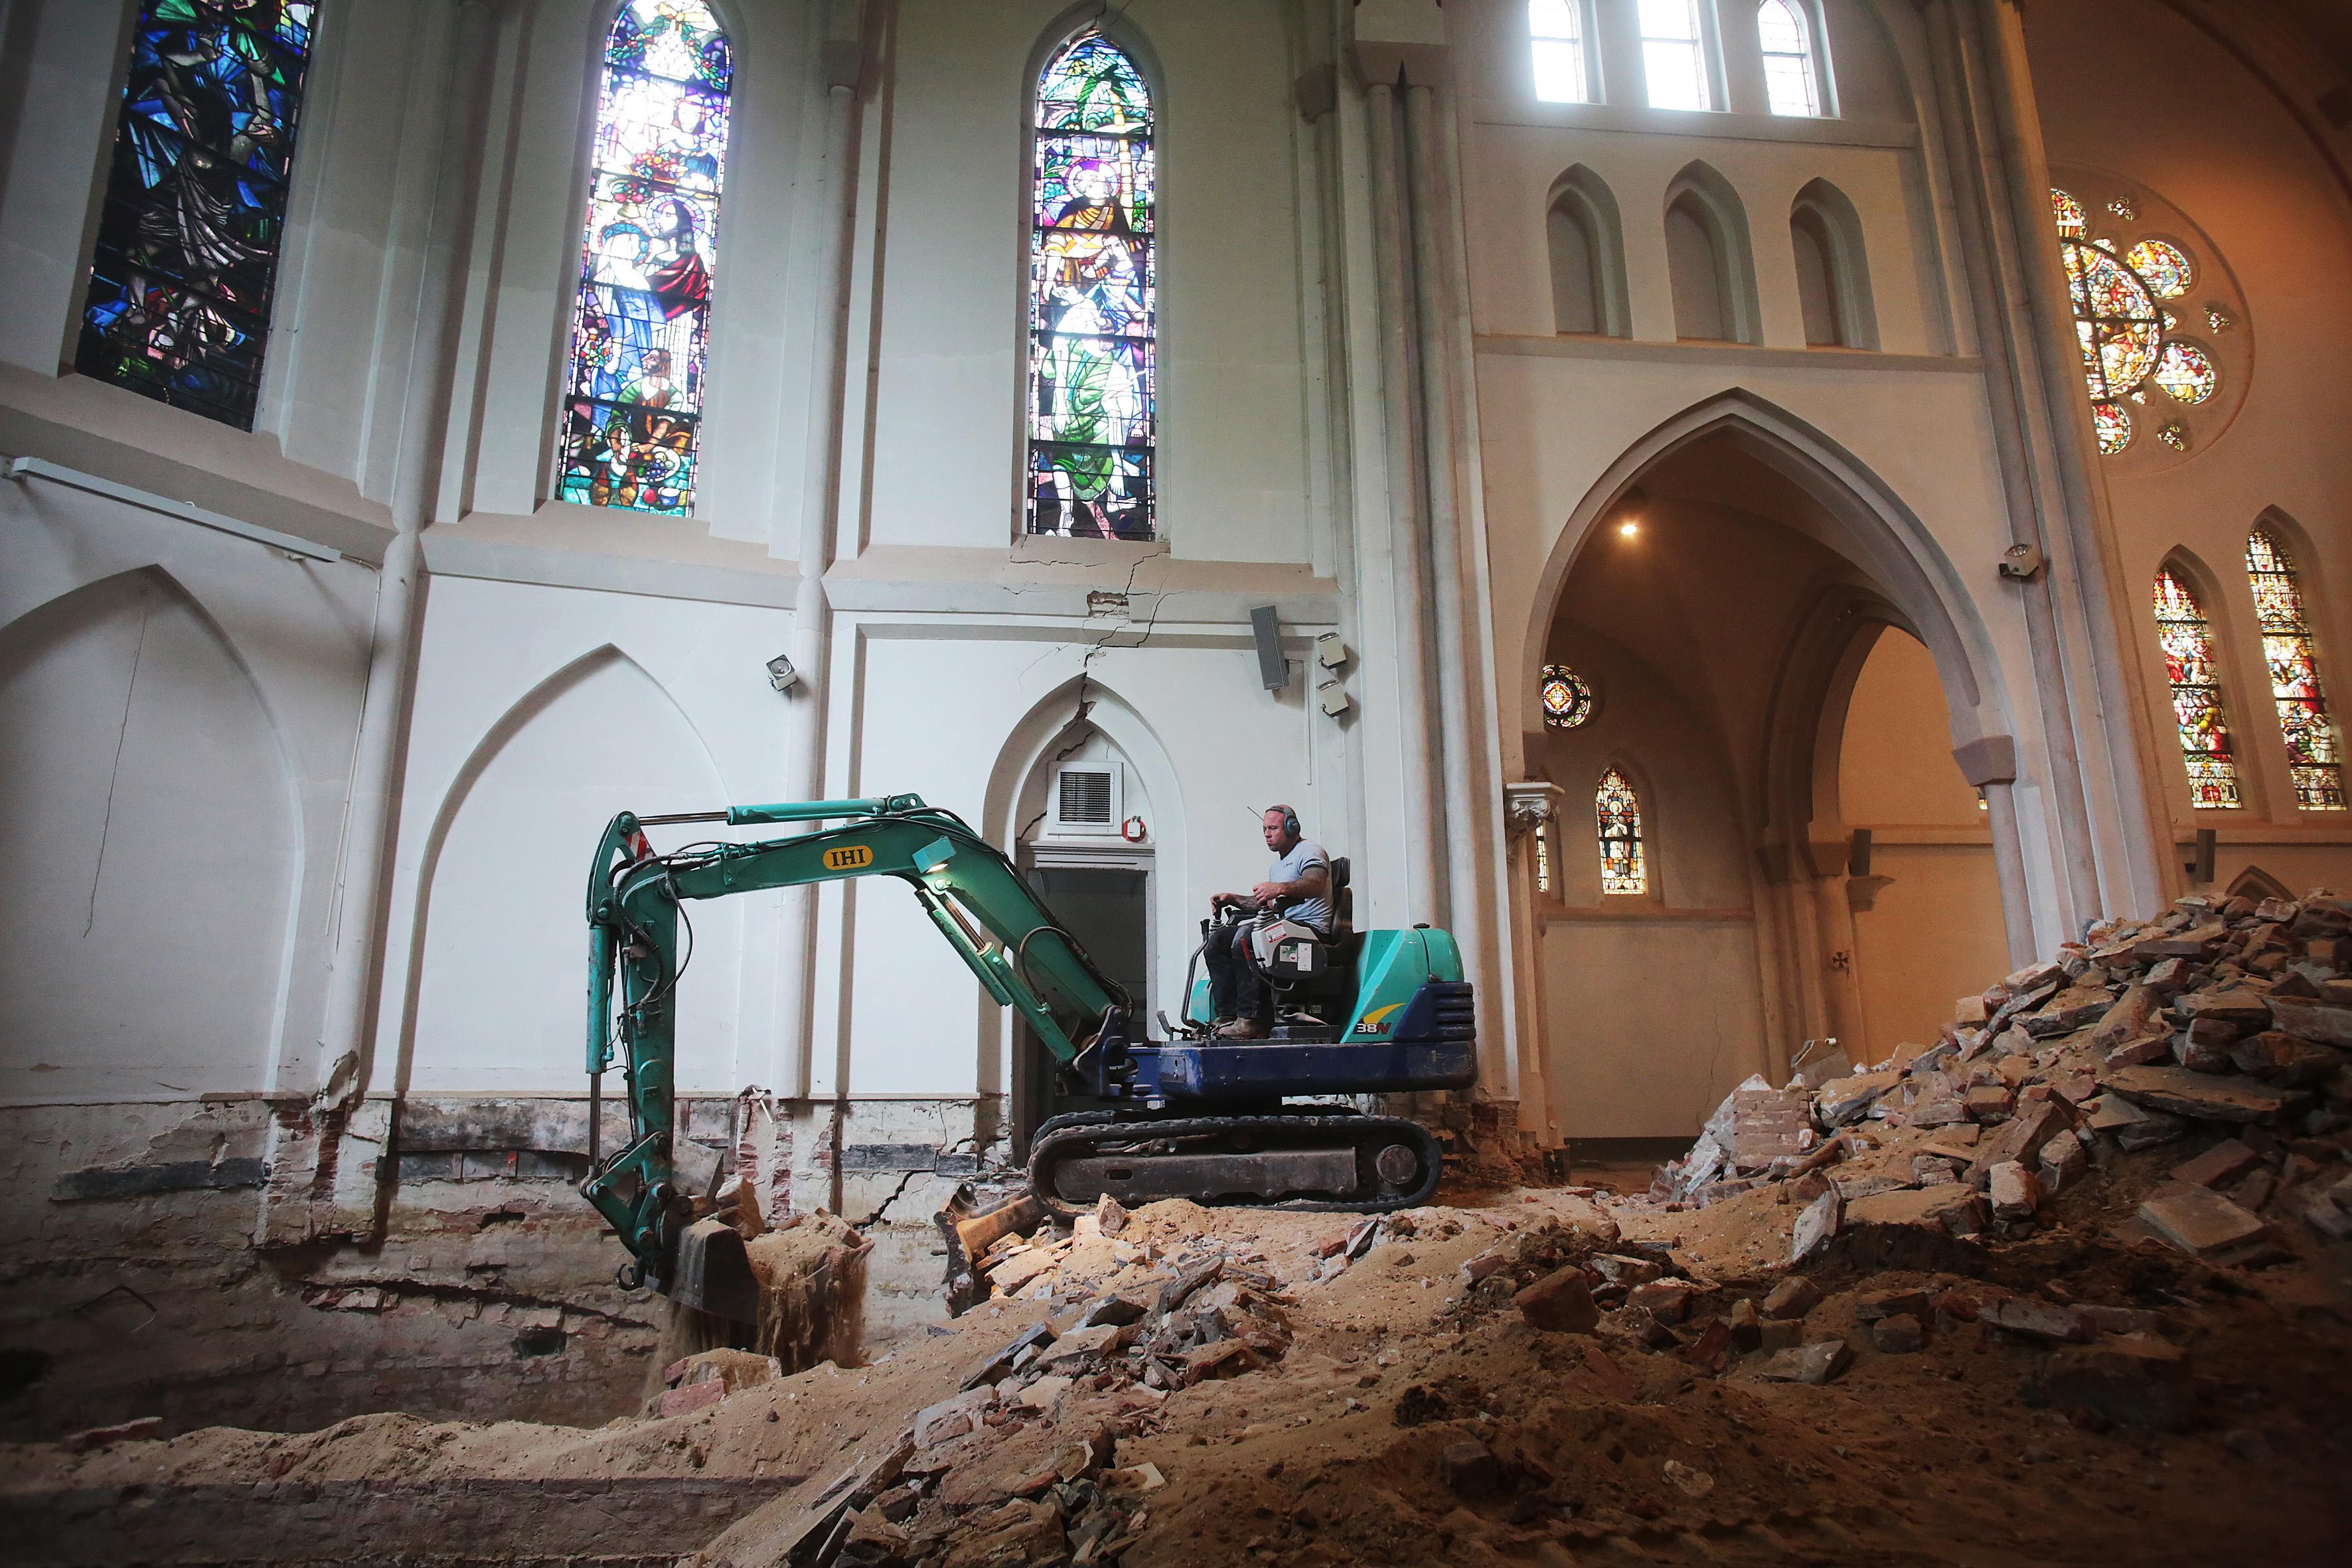 Herstel gestart van fundering Laurentiuskerk